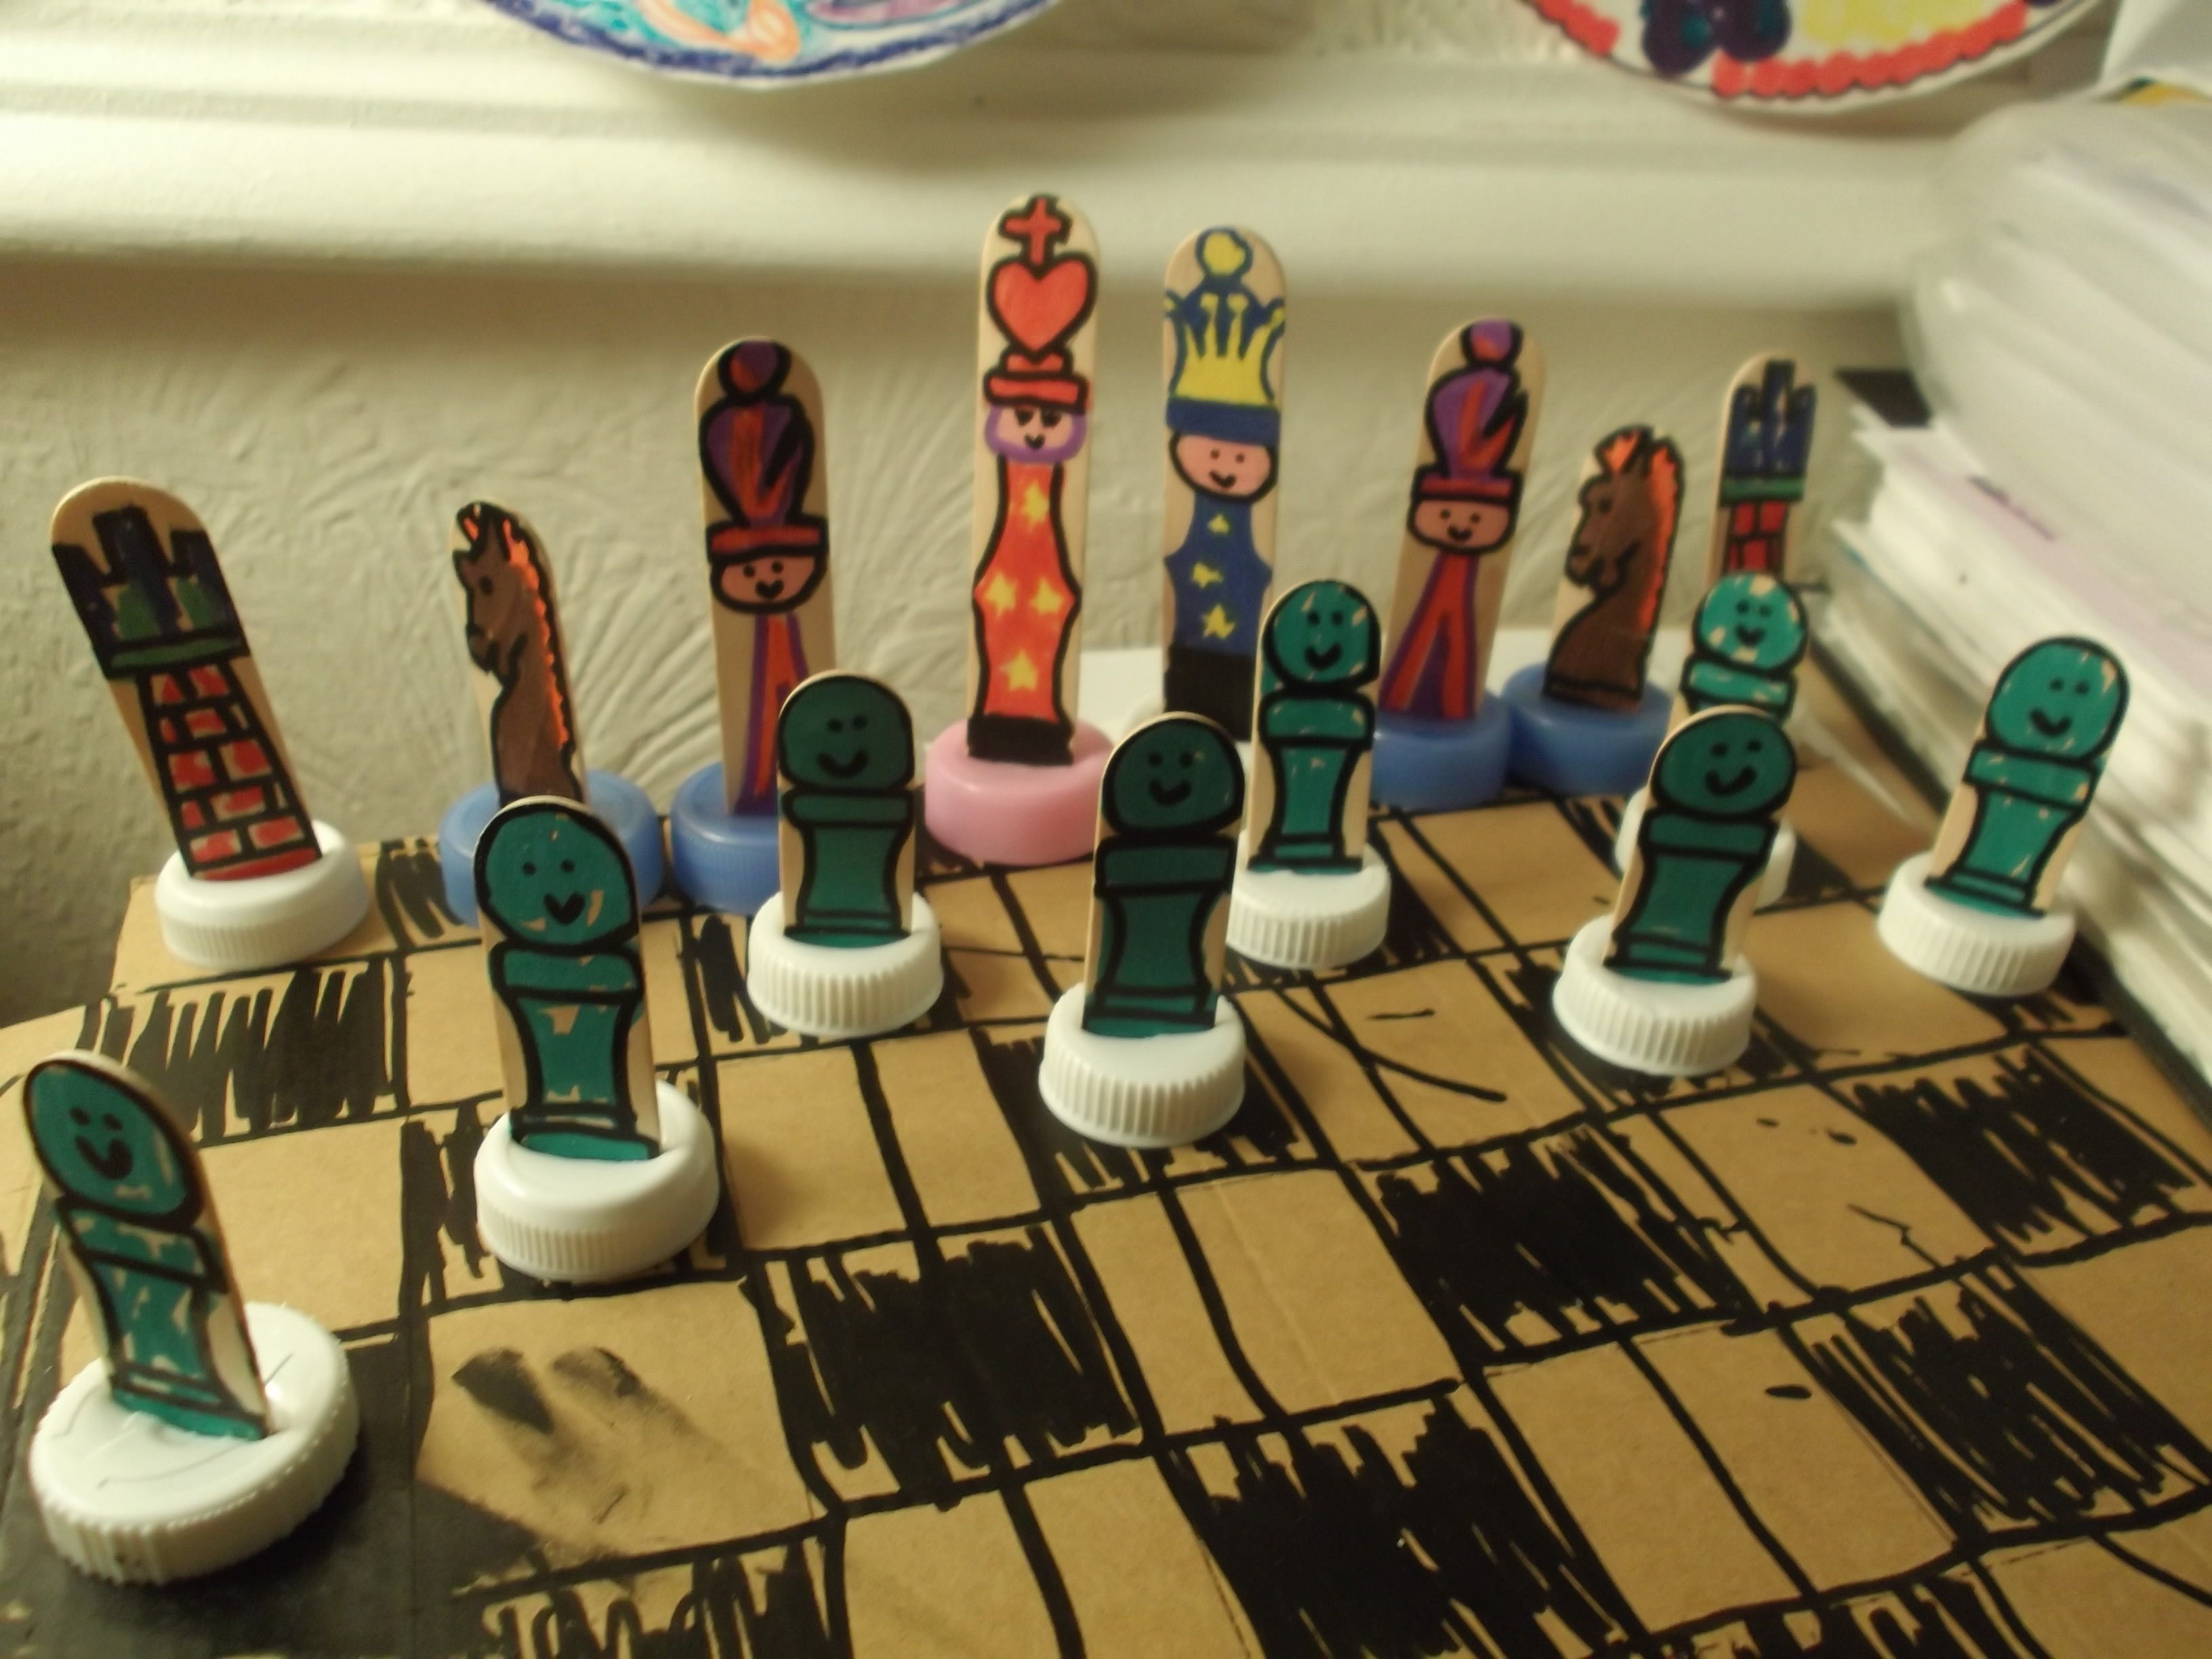 Week Chess Chess Set Part 1 Diy Chess Set Chess Set Chess